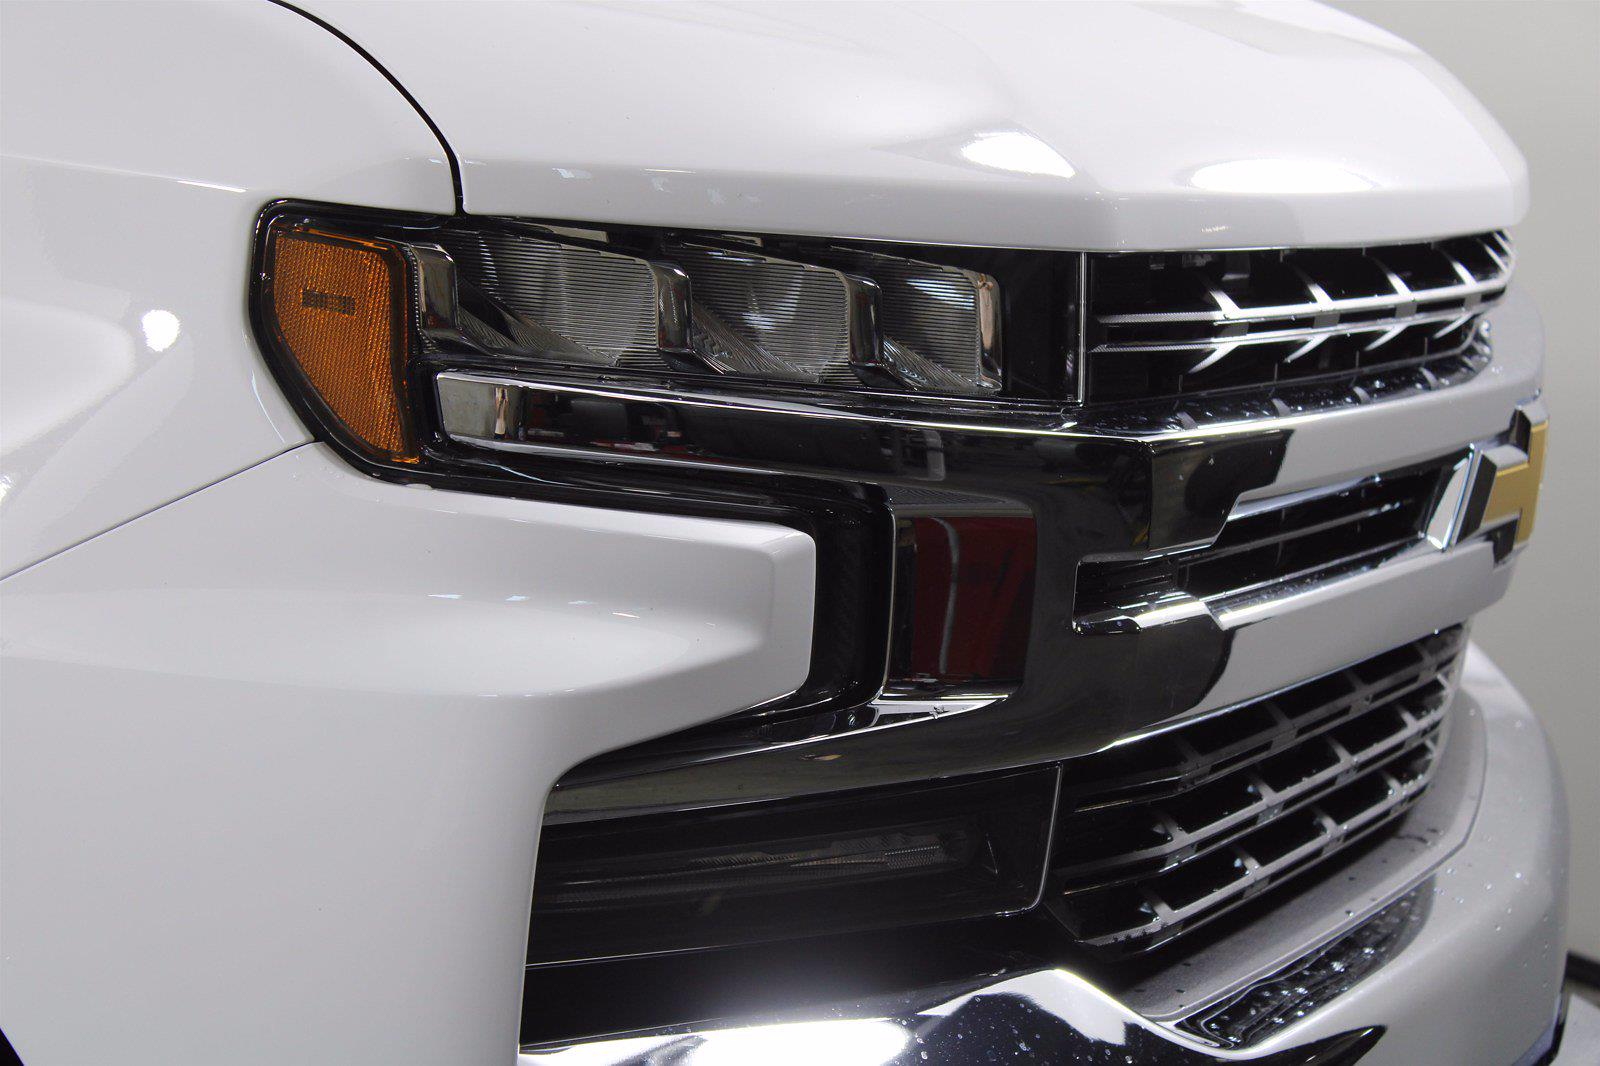 2021 Chevrolet Silverado 1500 Crew Cab 4x4, Pickup #D111143 - photo 5